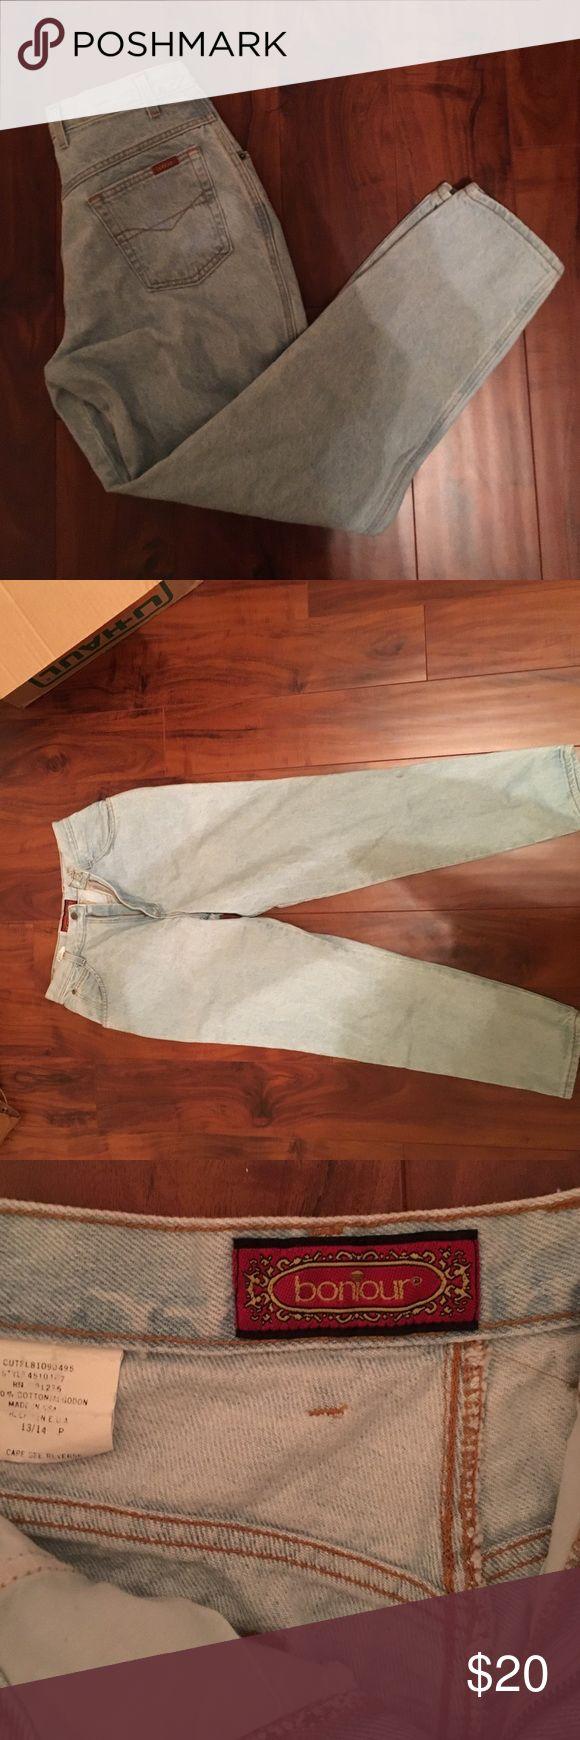 Bonjoir mom jeans Bonjour light wash jeans 15 waist measure flat 39 leg Vintage Pants Straight Leg